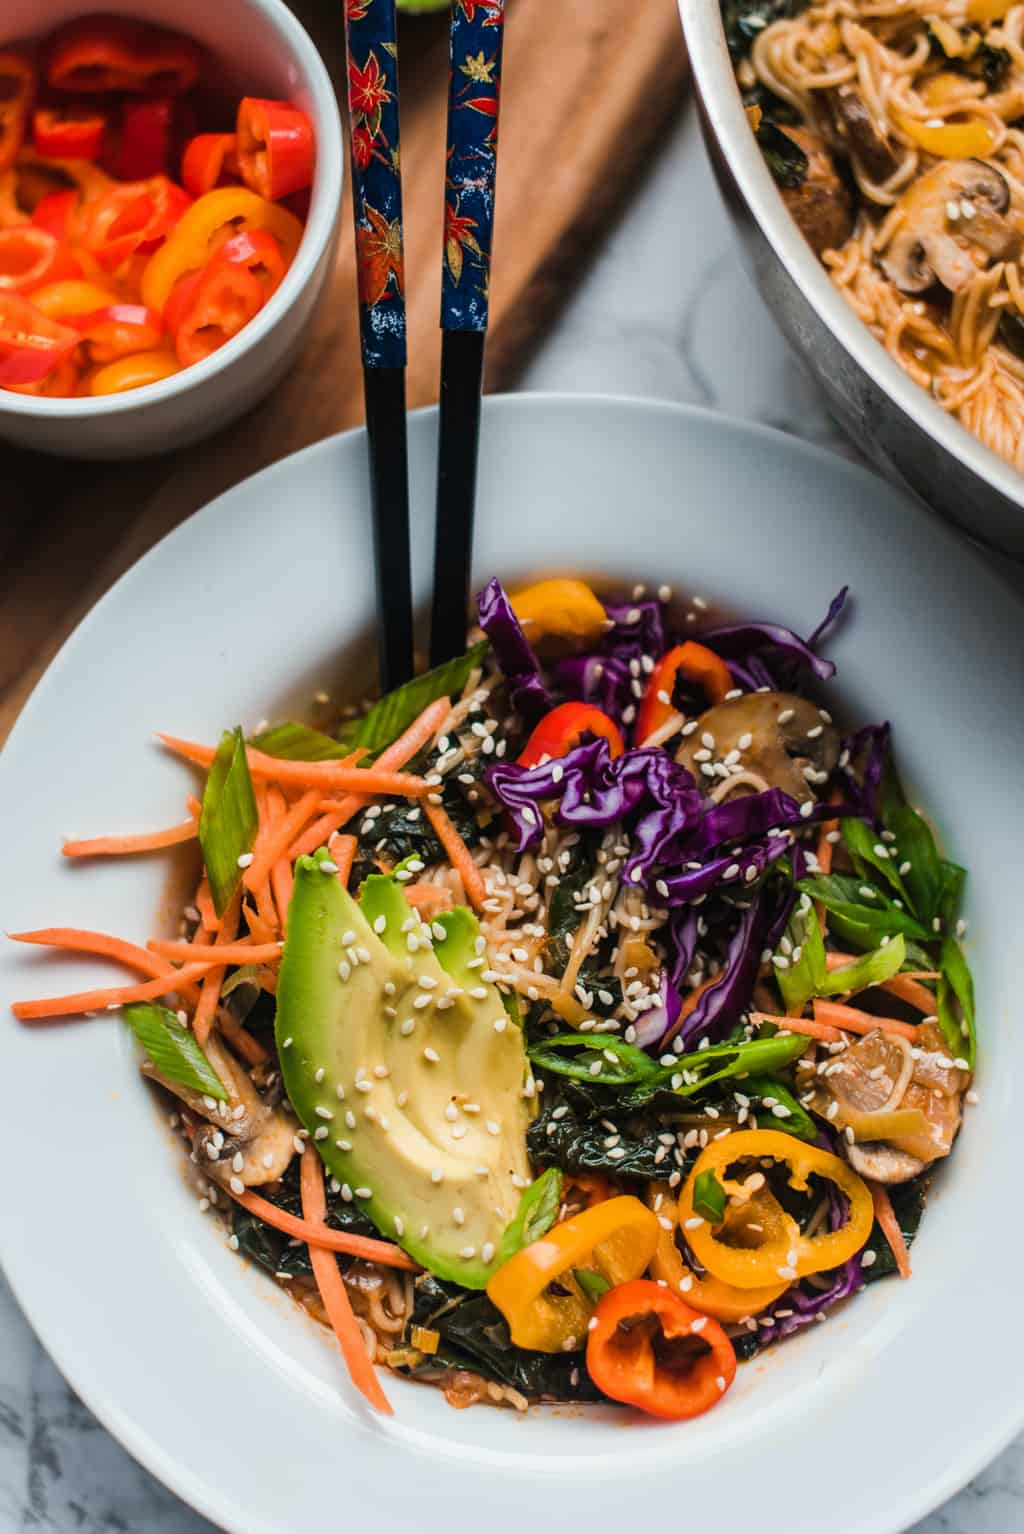 Noodles Vergetarian